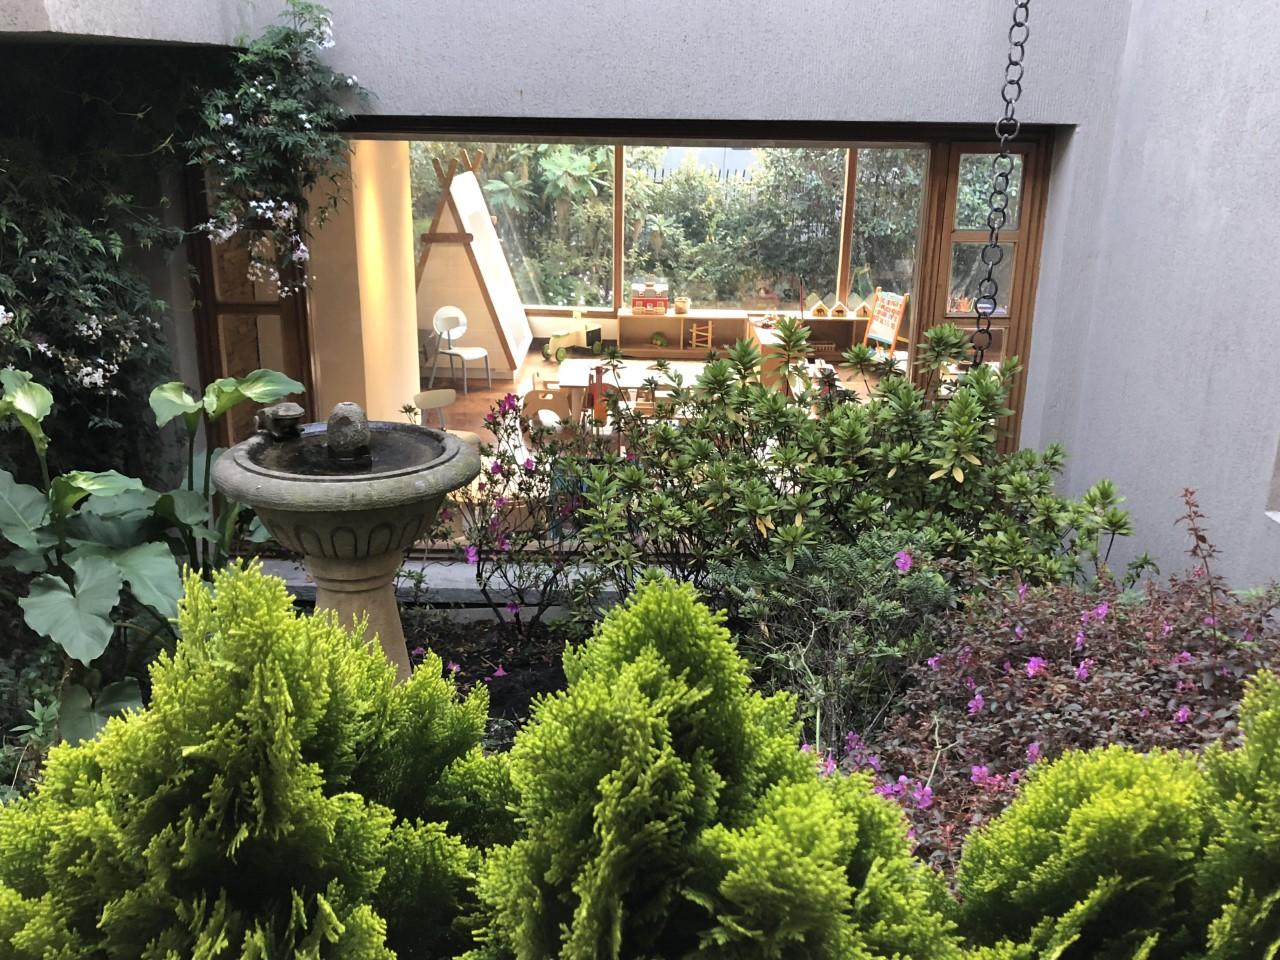 MV foto salon 1 ventana.jpg